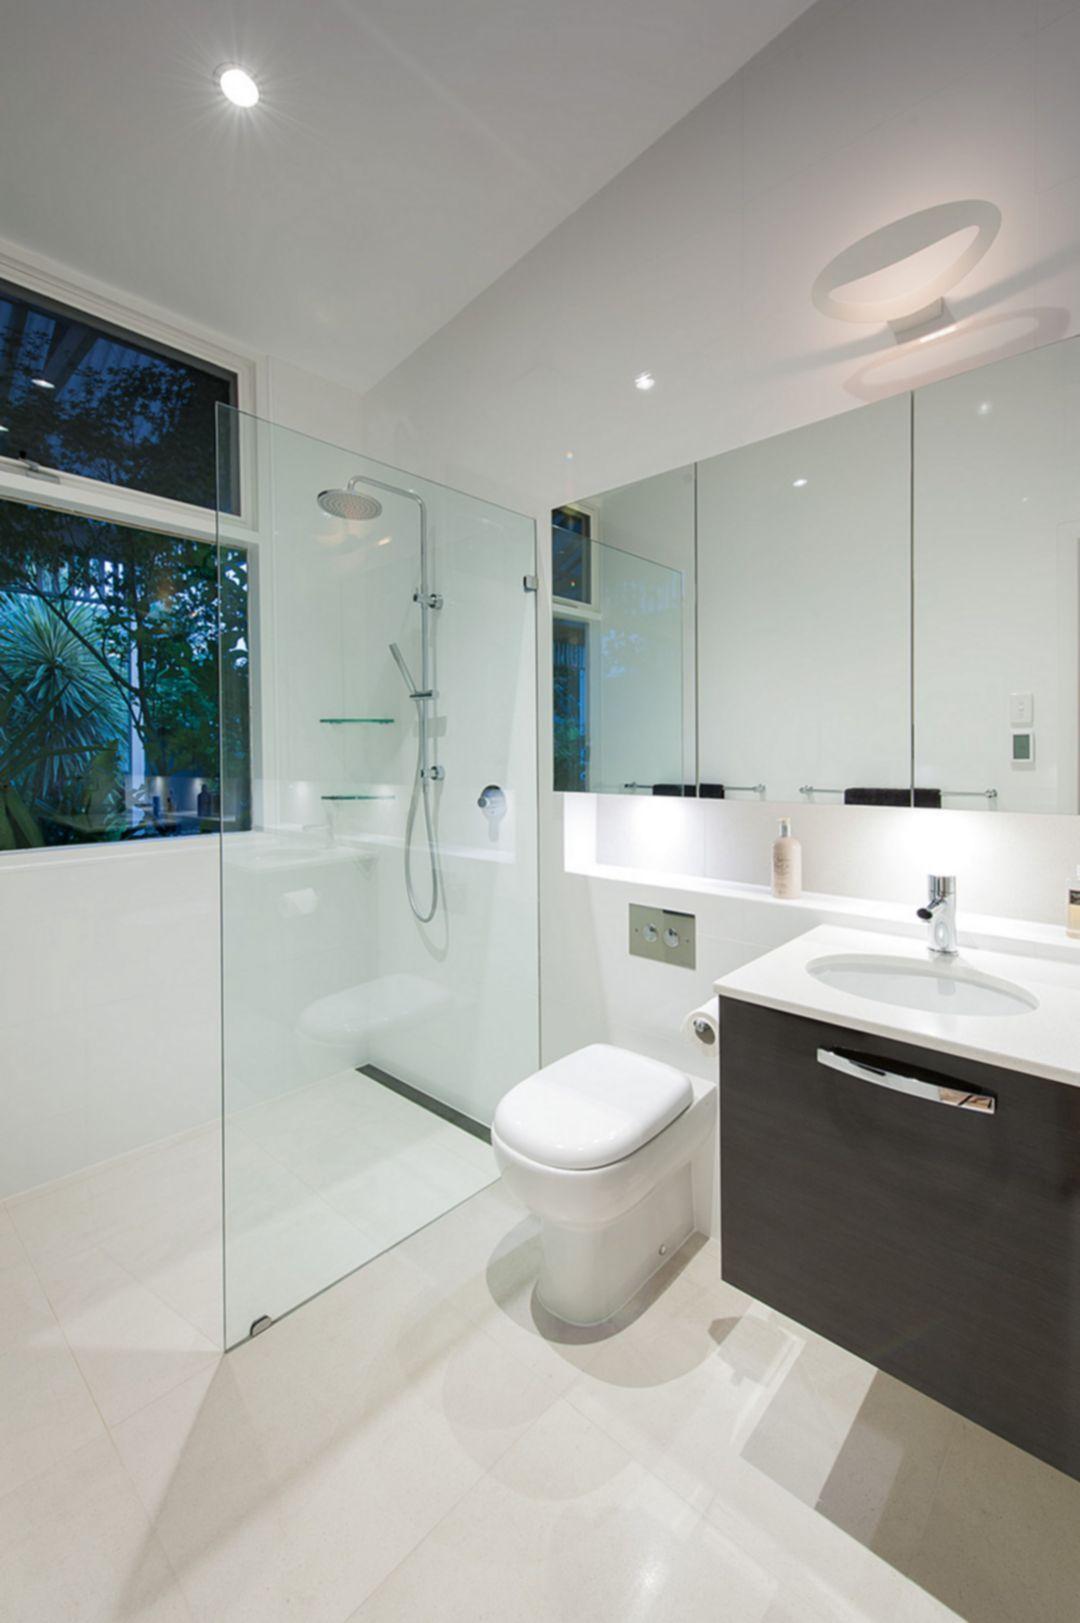 Fabulous 10 Amazing Minimalist Bathroom Ideas You